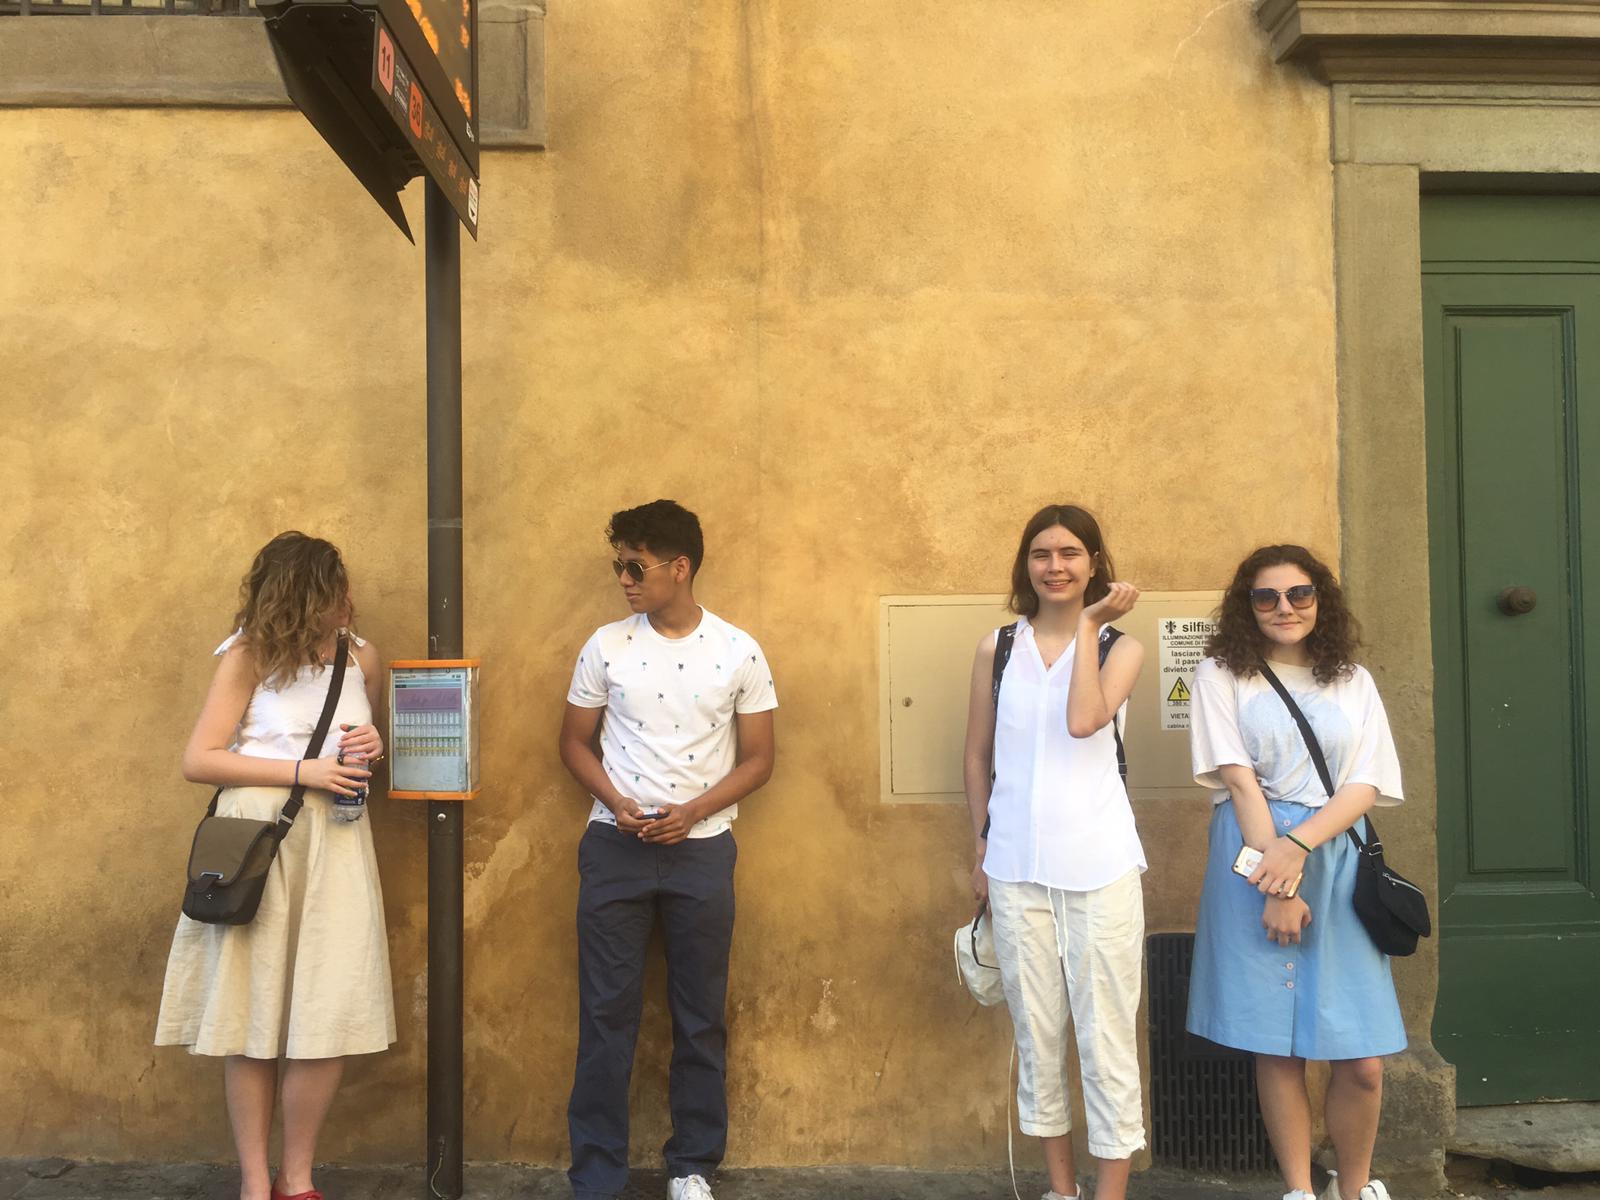 The Creative Writing Crew: Edie Lipsey, Nicholas Perez, Anna Westwig, and Johanna Von Maack